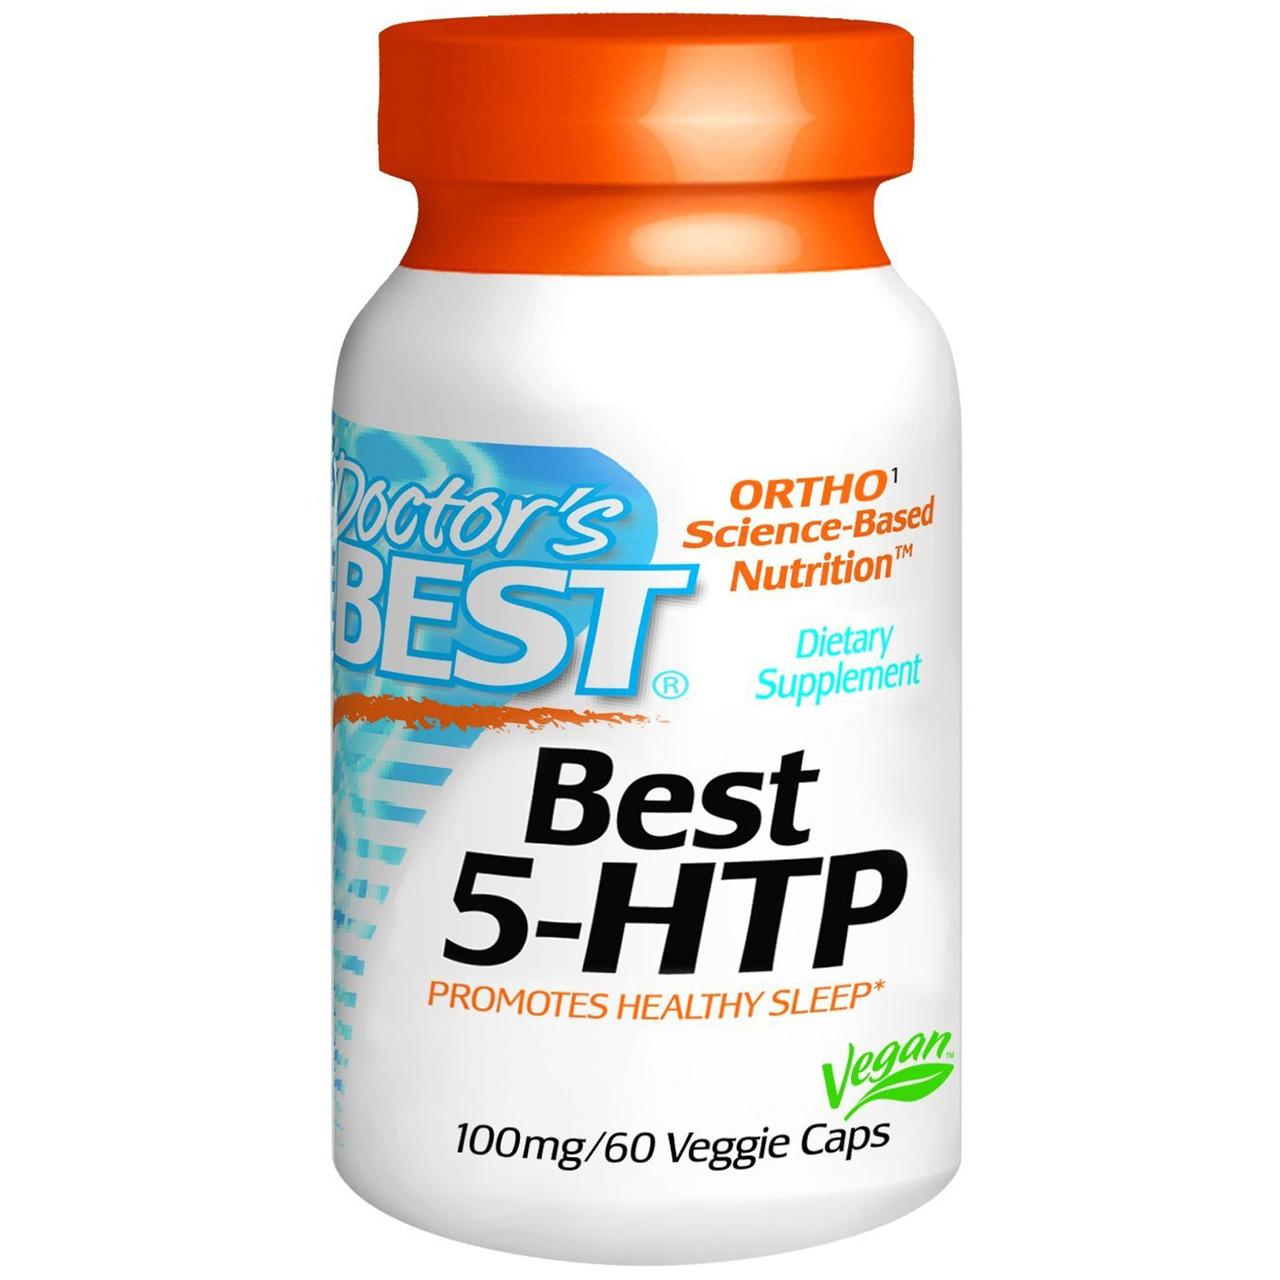 5-Гидрокситриптофан (5-HTP), Doctor's Best, 100 мг, 180 капсул. Сделано в США.